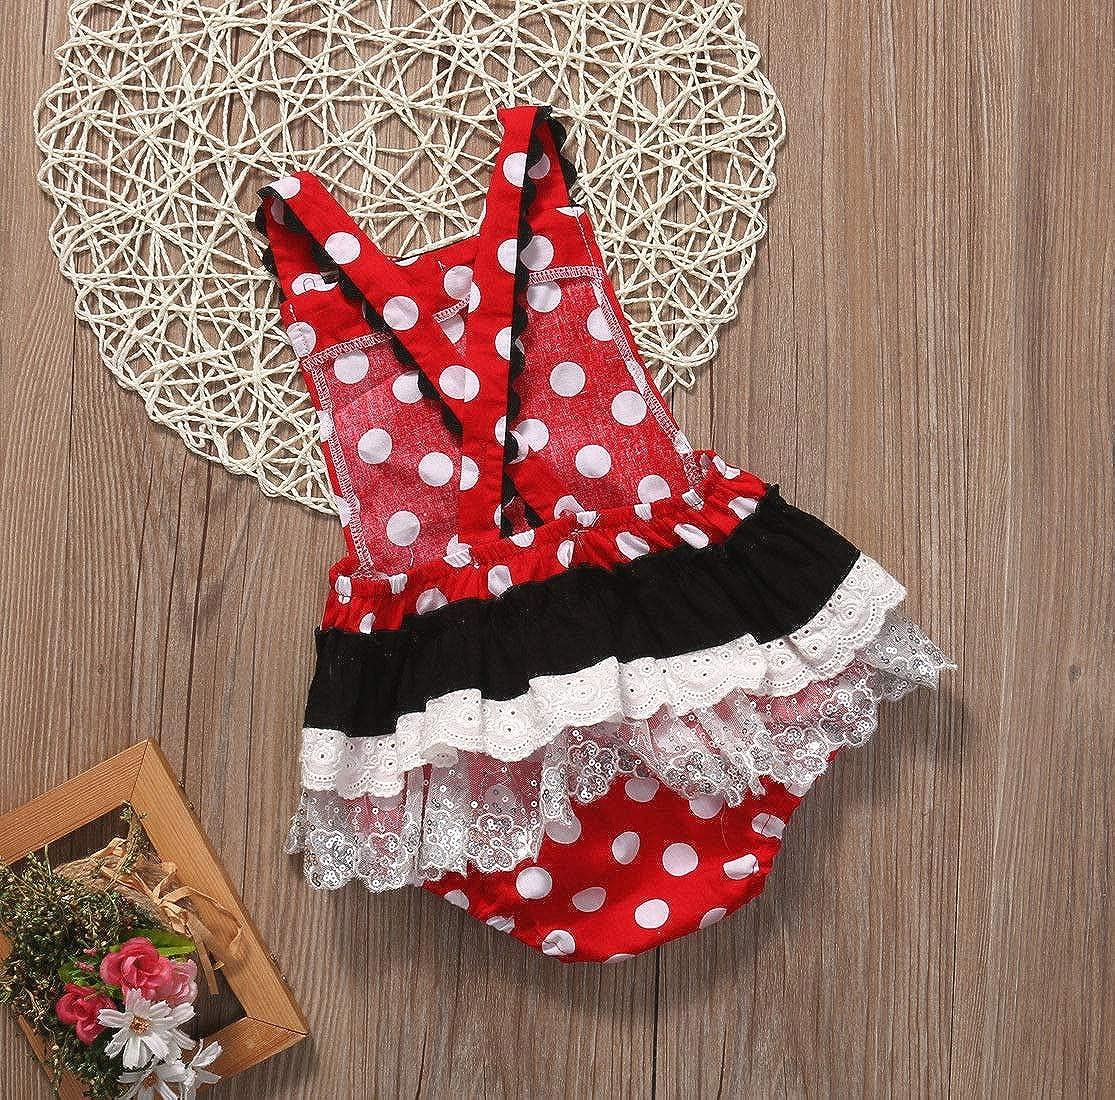 Cartoon Big Bow Minnie Mouse Shoulder Bag Casual Polka Dot Playwear Outfits Baby Toddler Girls Ruffles Disney Dress